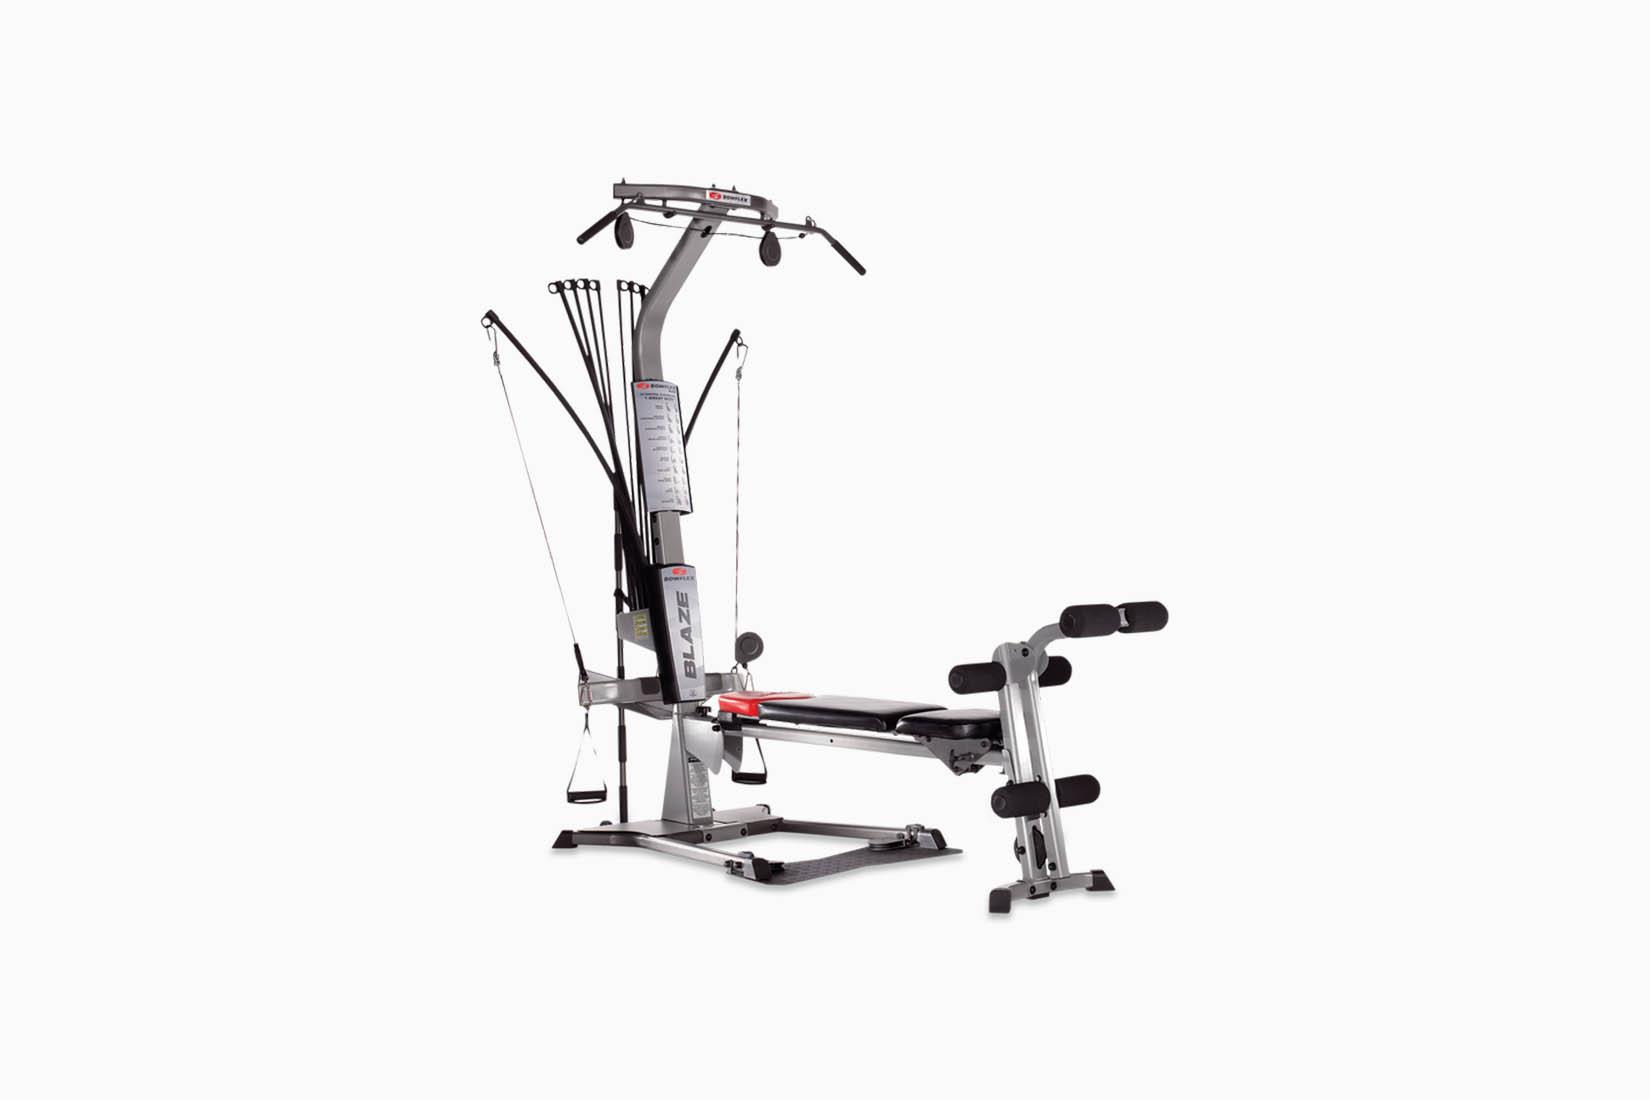 best home gym equipment bowflex review - luxe digital